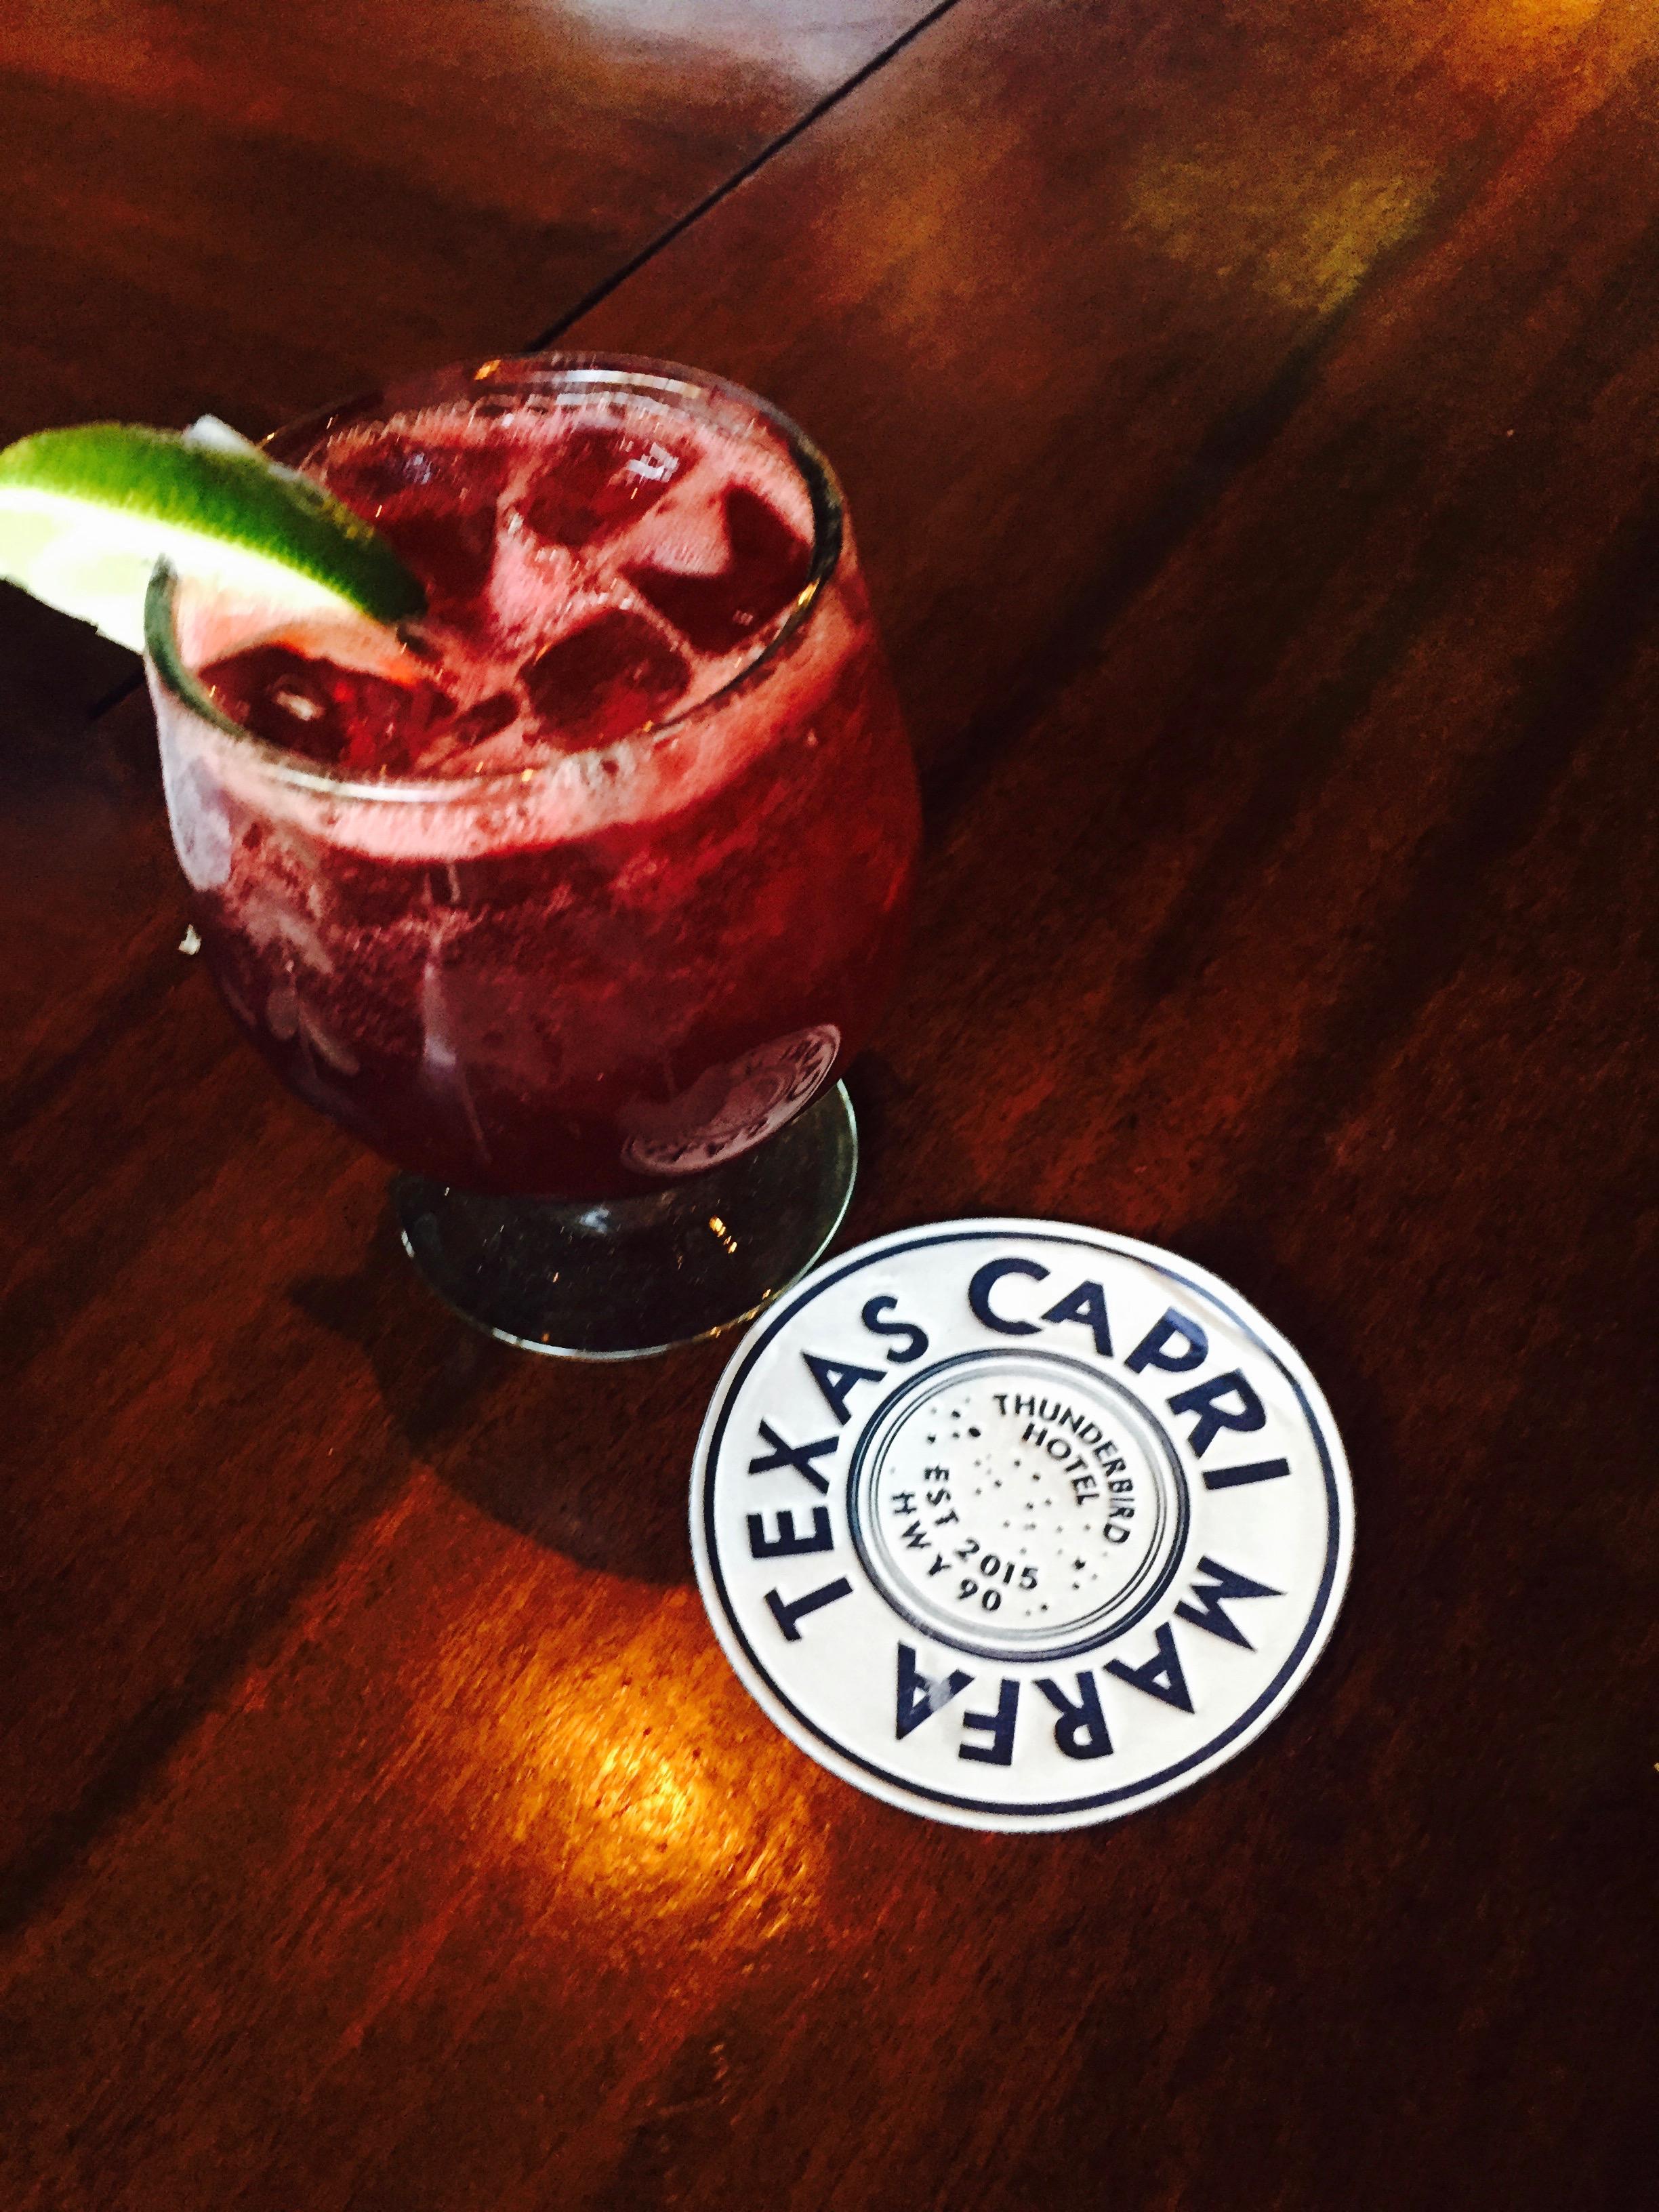 hotel drink at the Thunderbird Hotel, Marfa, Texas - 3 Days*